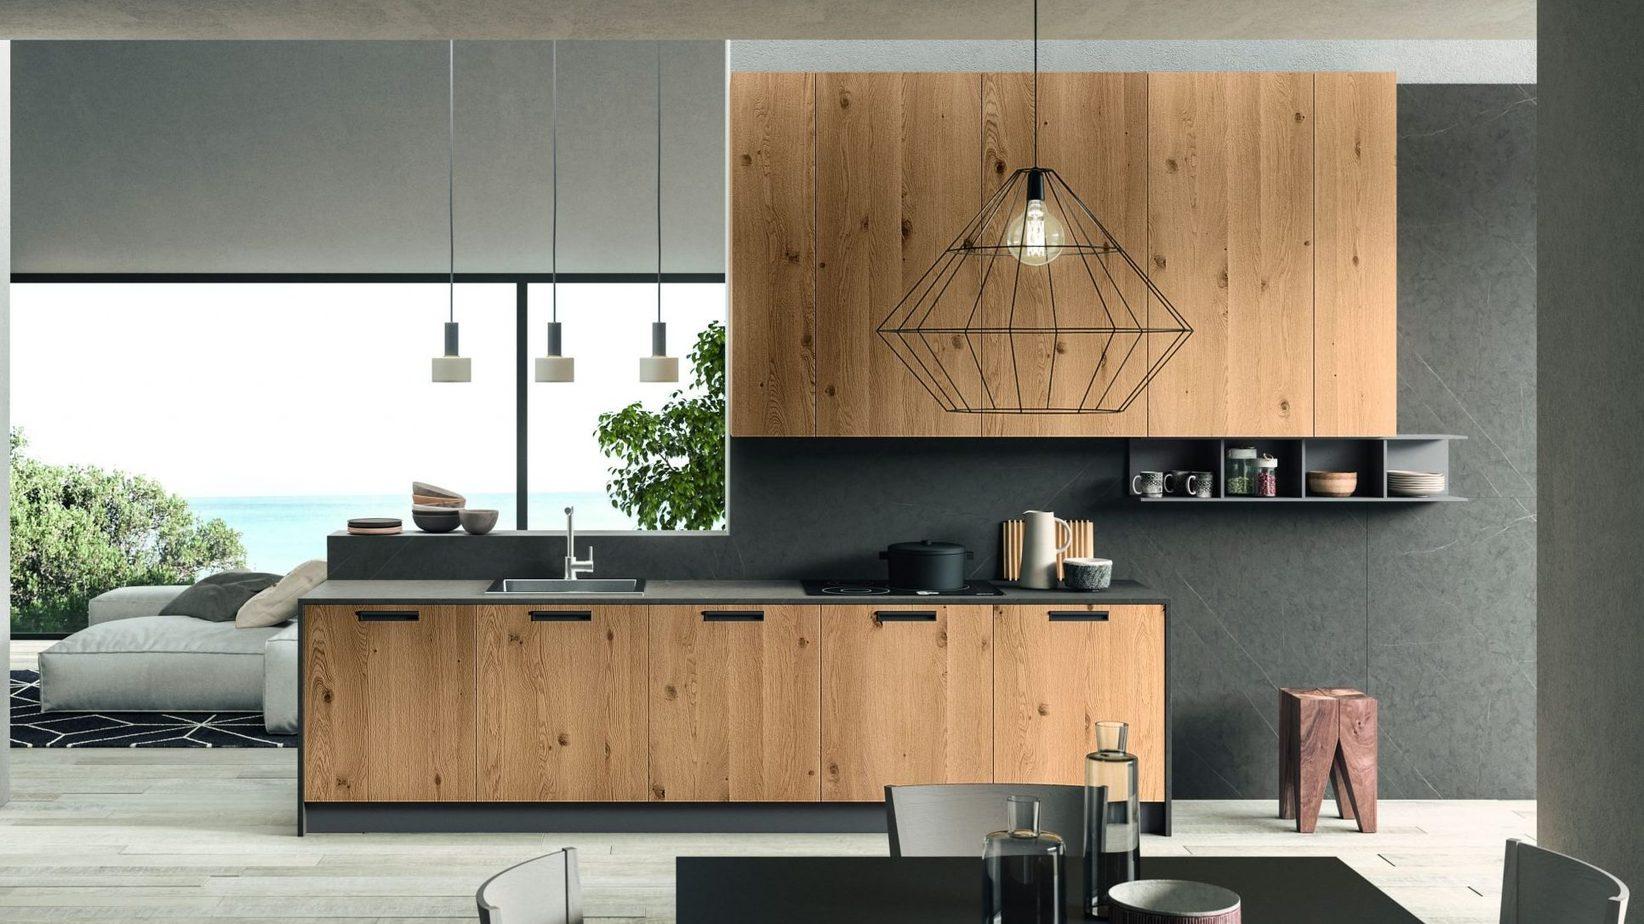 Cucina di design Rovere Nodato da Lab Cucine Torino